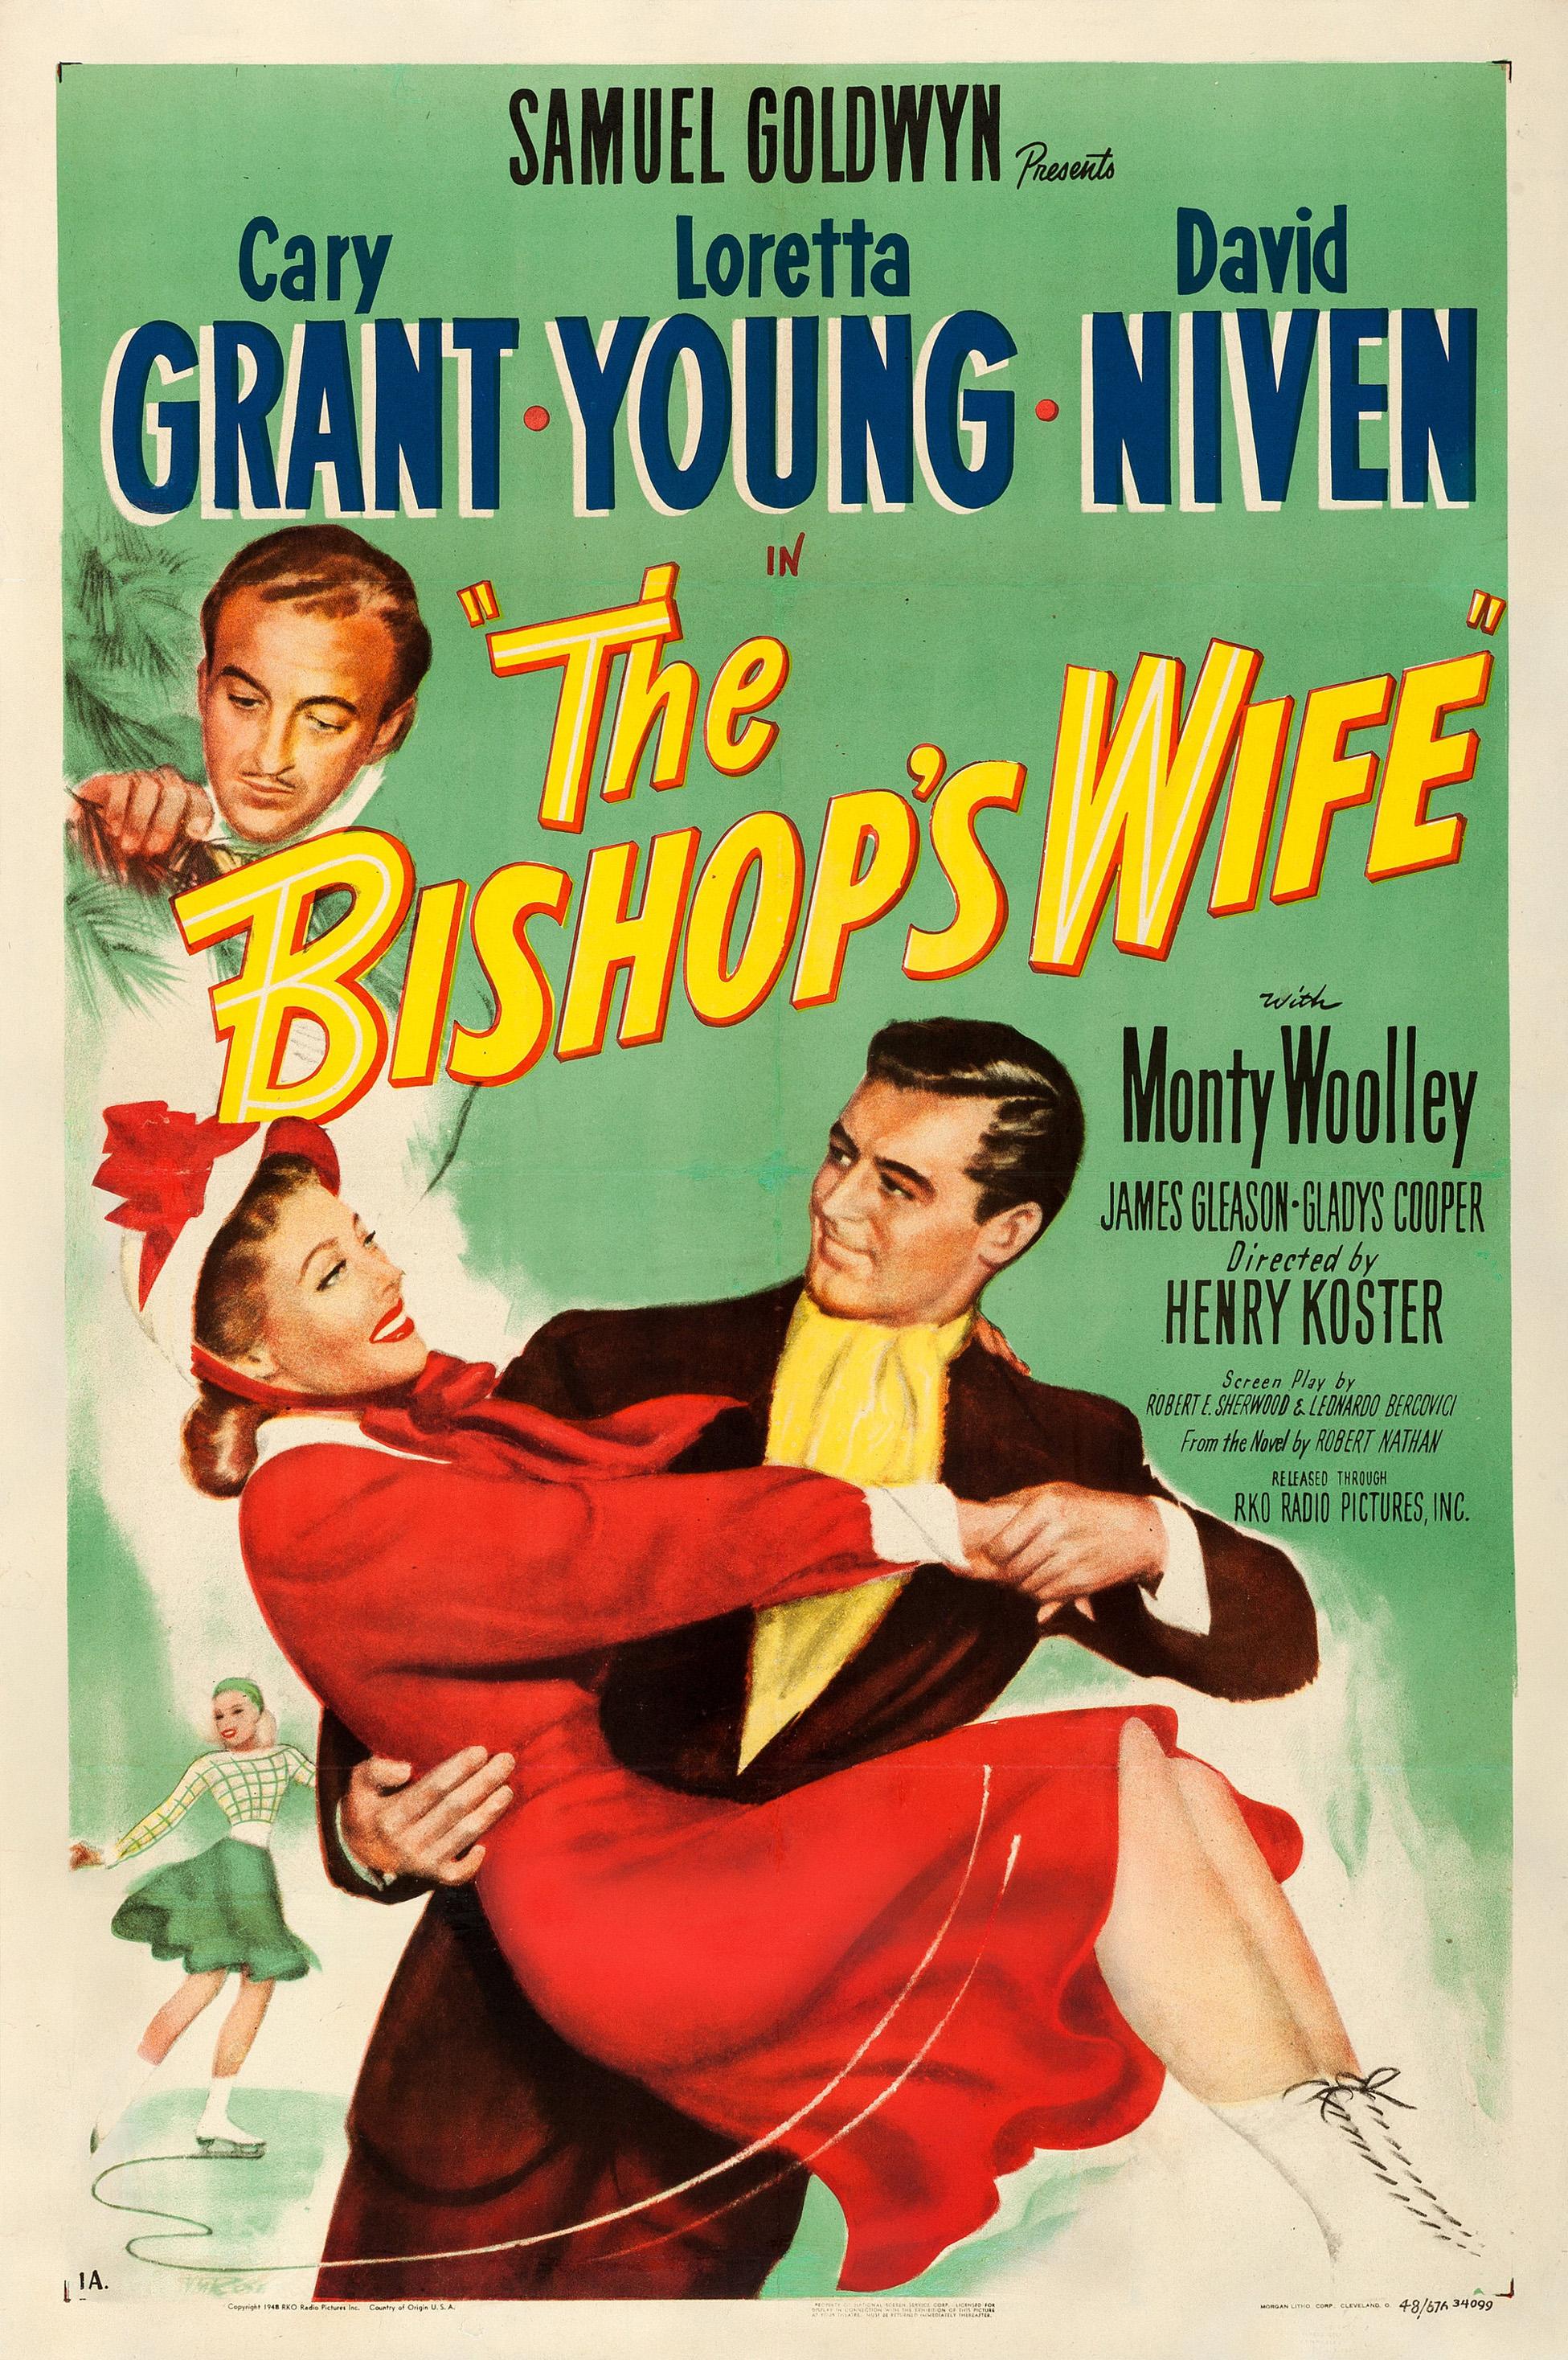 The Bishop's Wife - Wikipedia